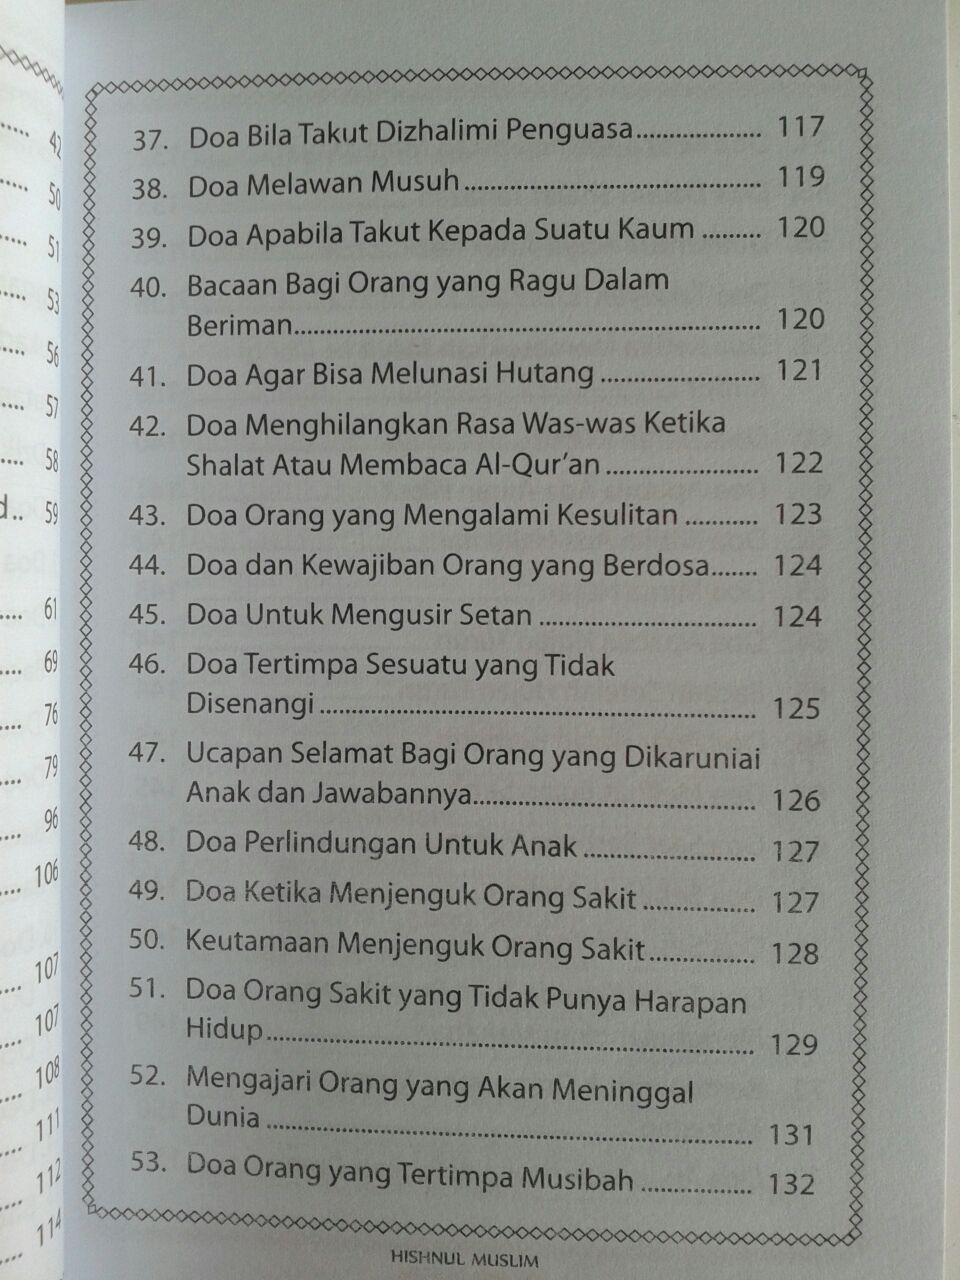 Buku Saku Hishnul Muslim Panduan Doa Dan Dzikir Sehari Hari isi